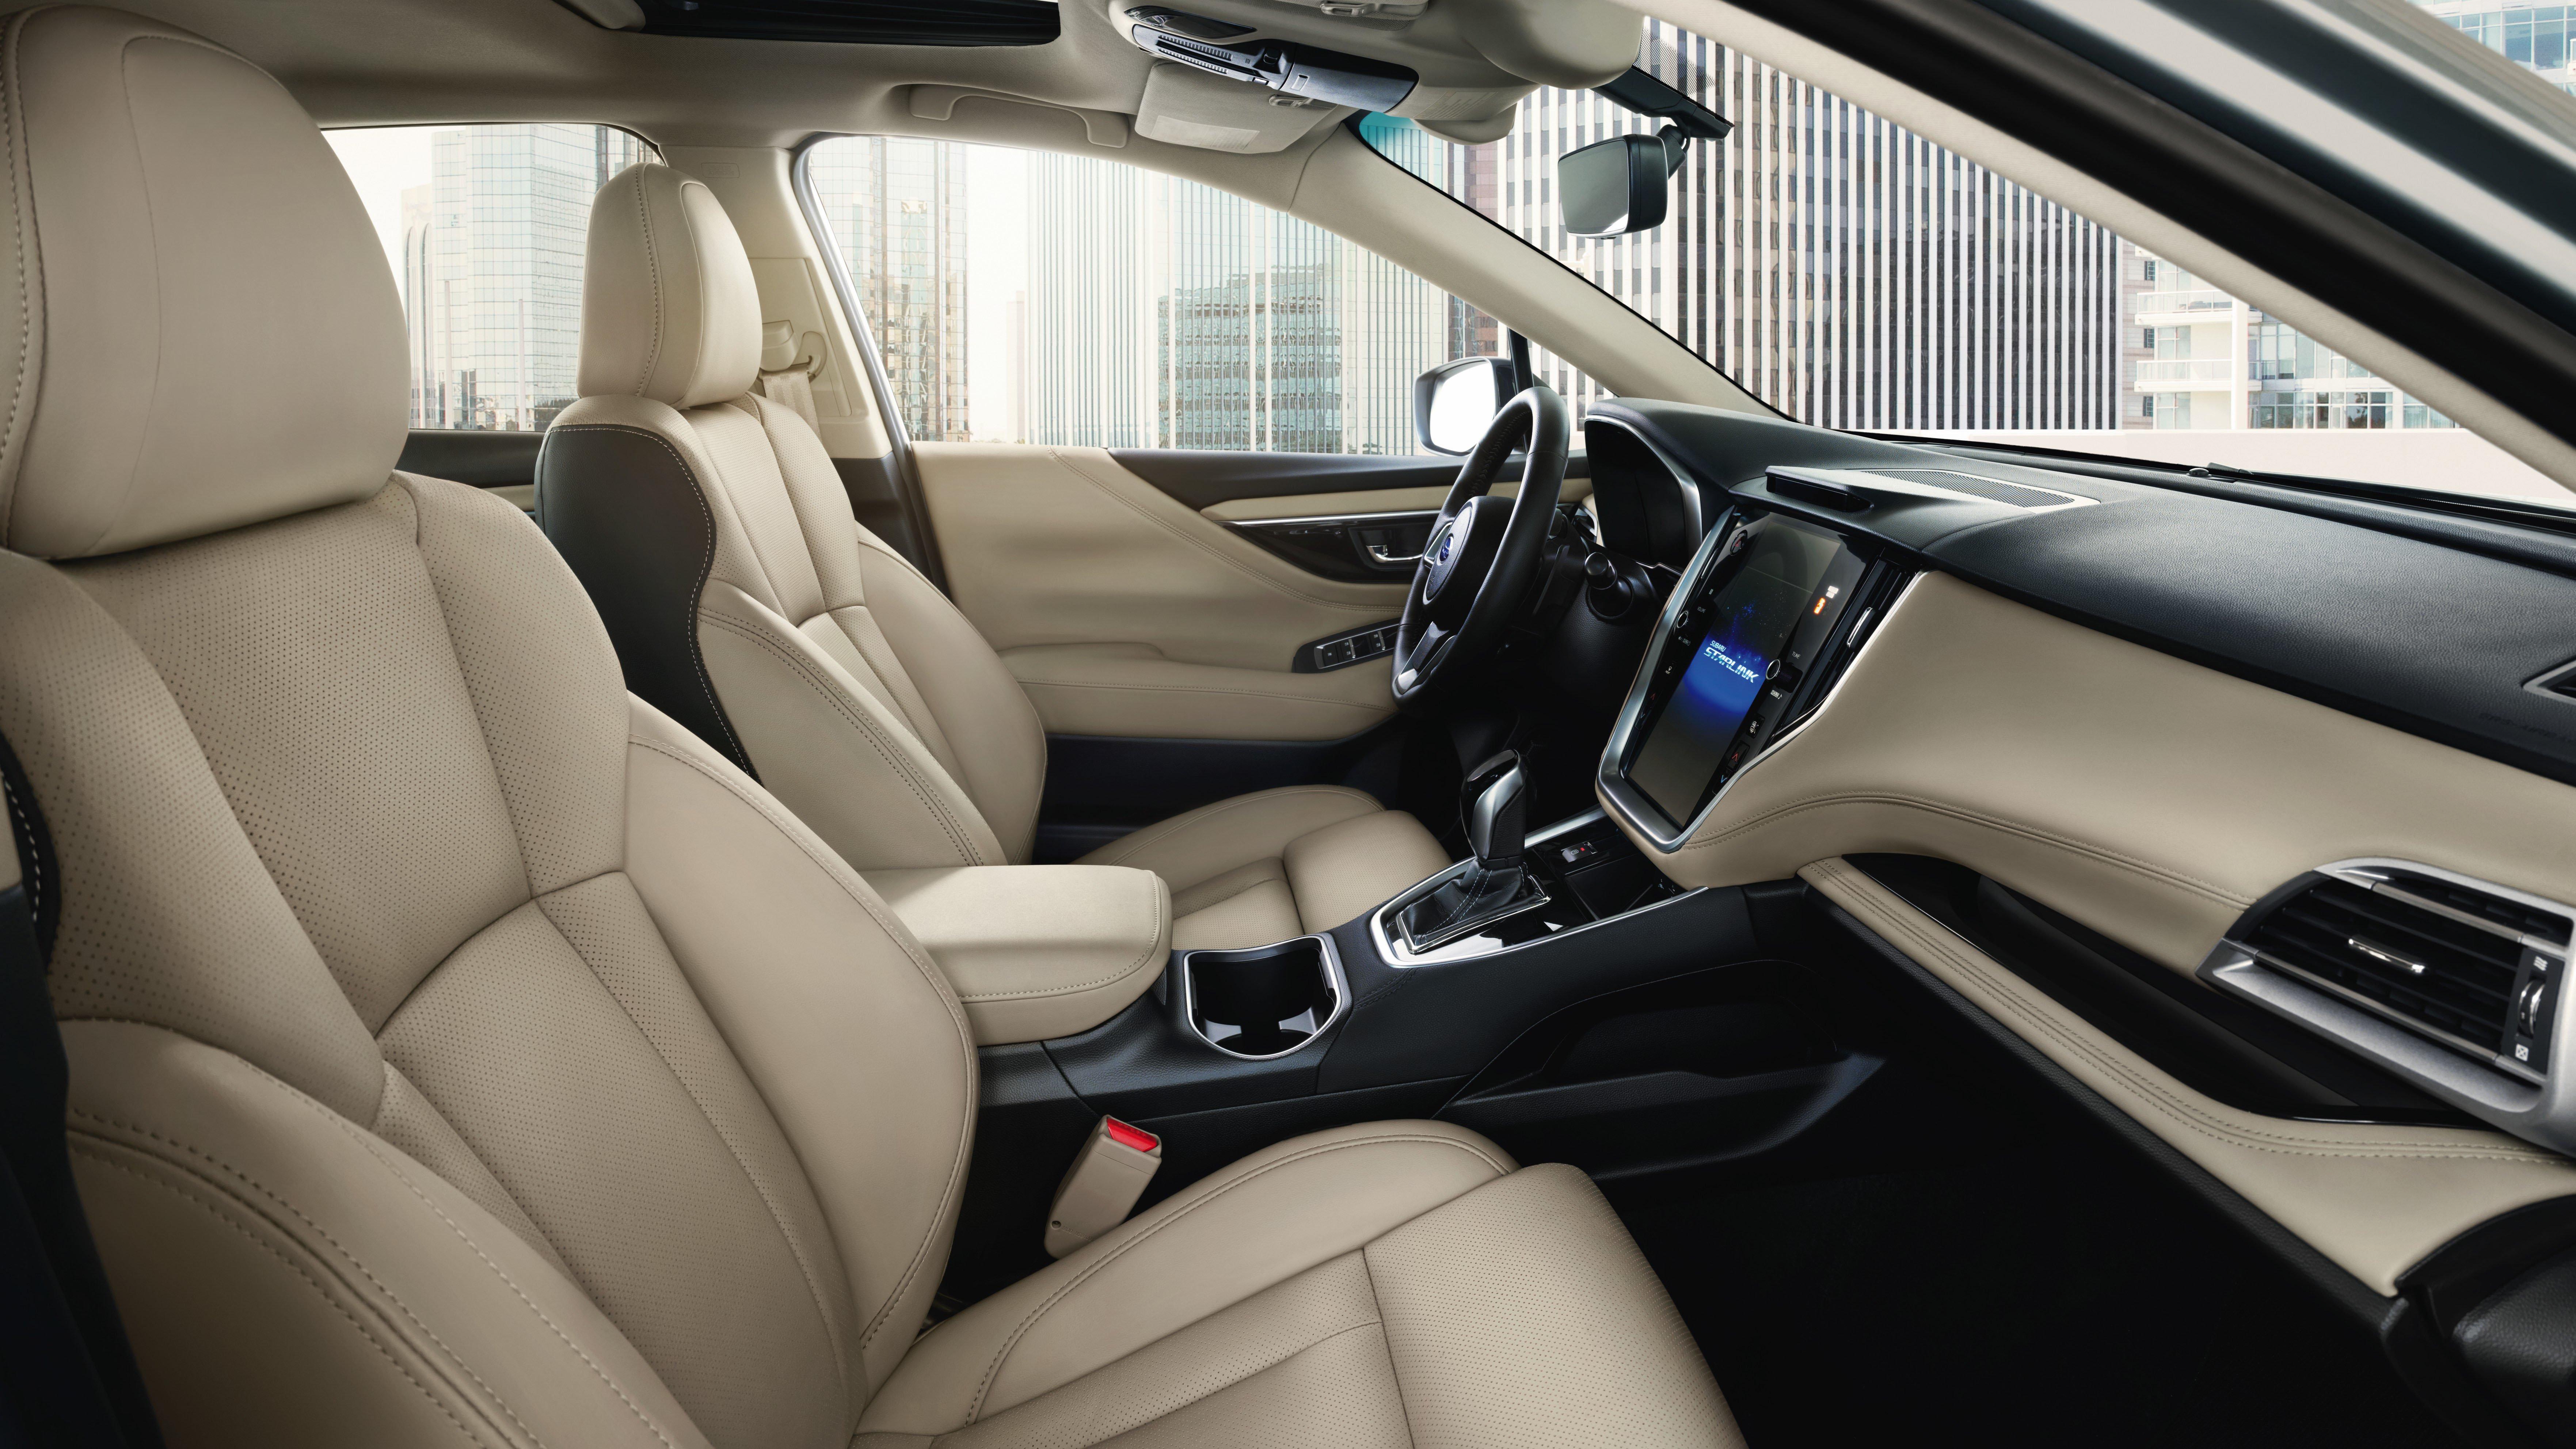 2020 Subaru Liberty Redesign and Concept